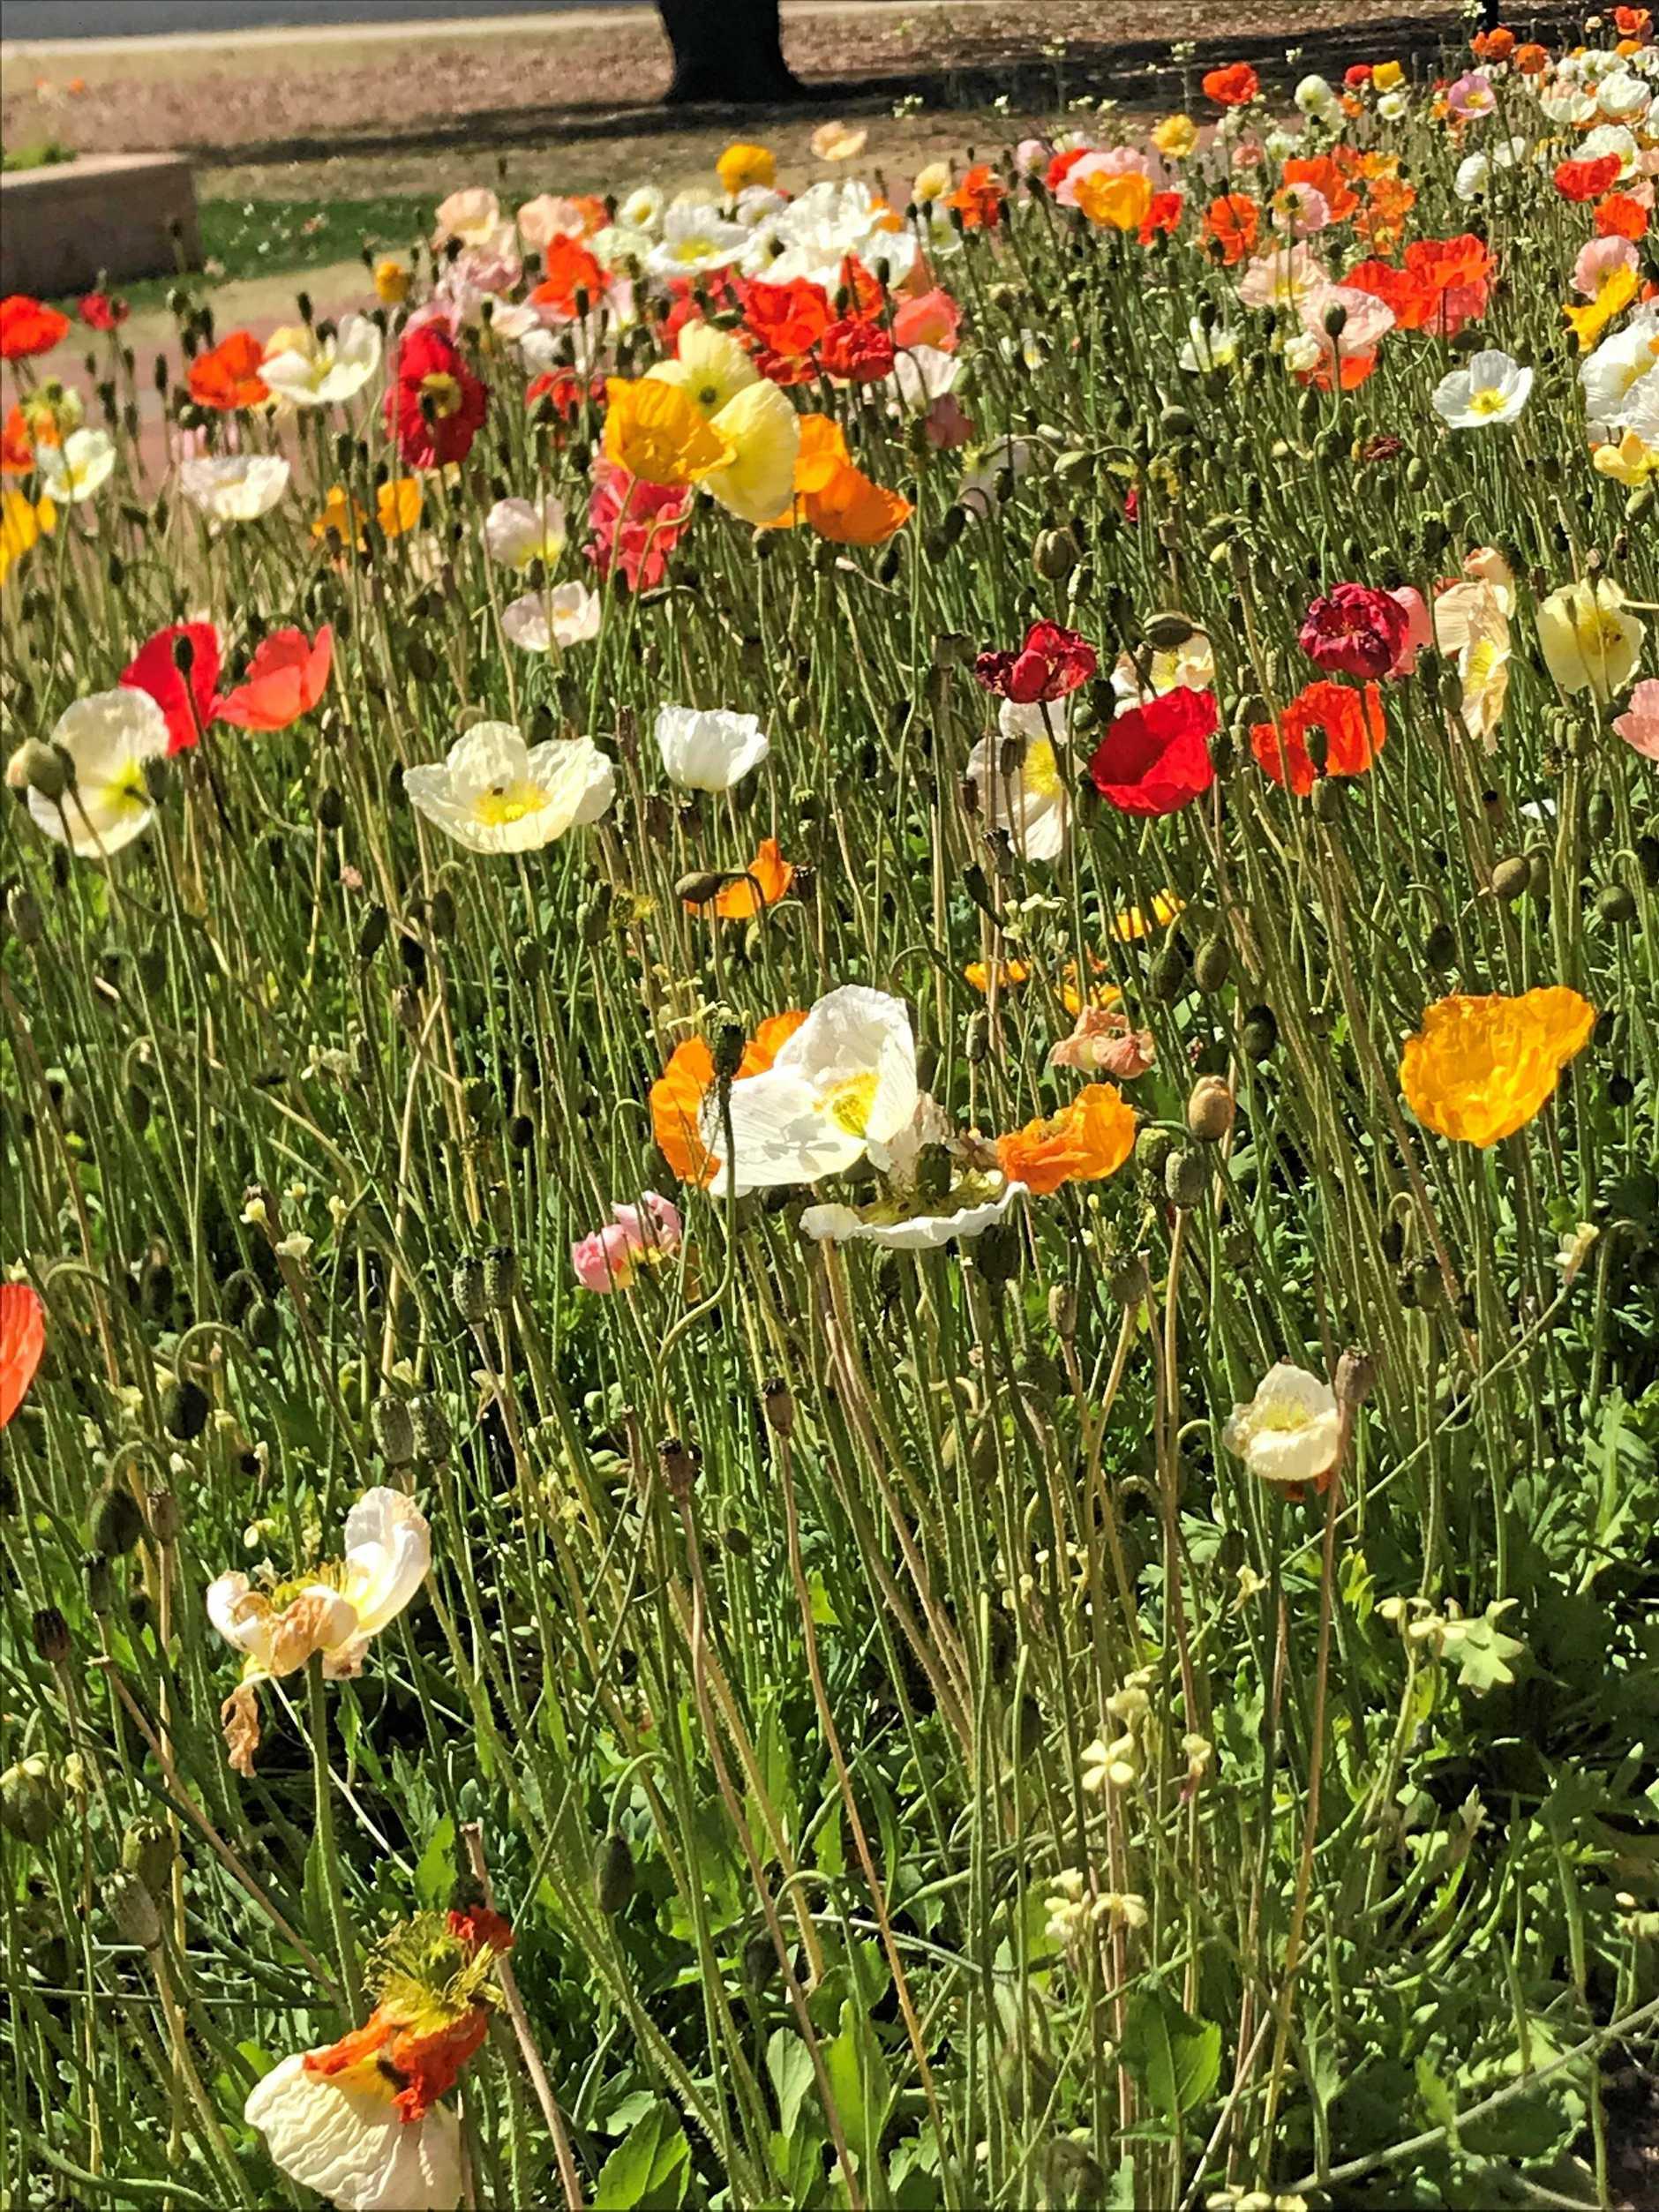 SPRINGTIME: The flowers are blooming in Kingaroy's Memorial Park.